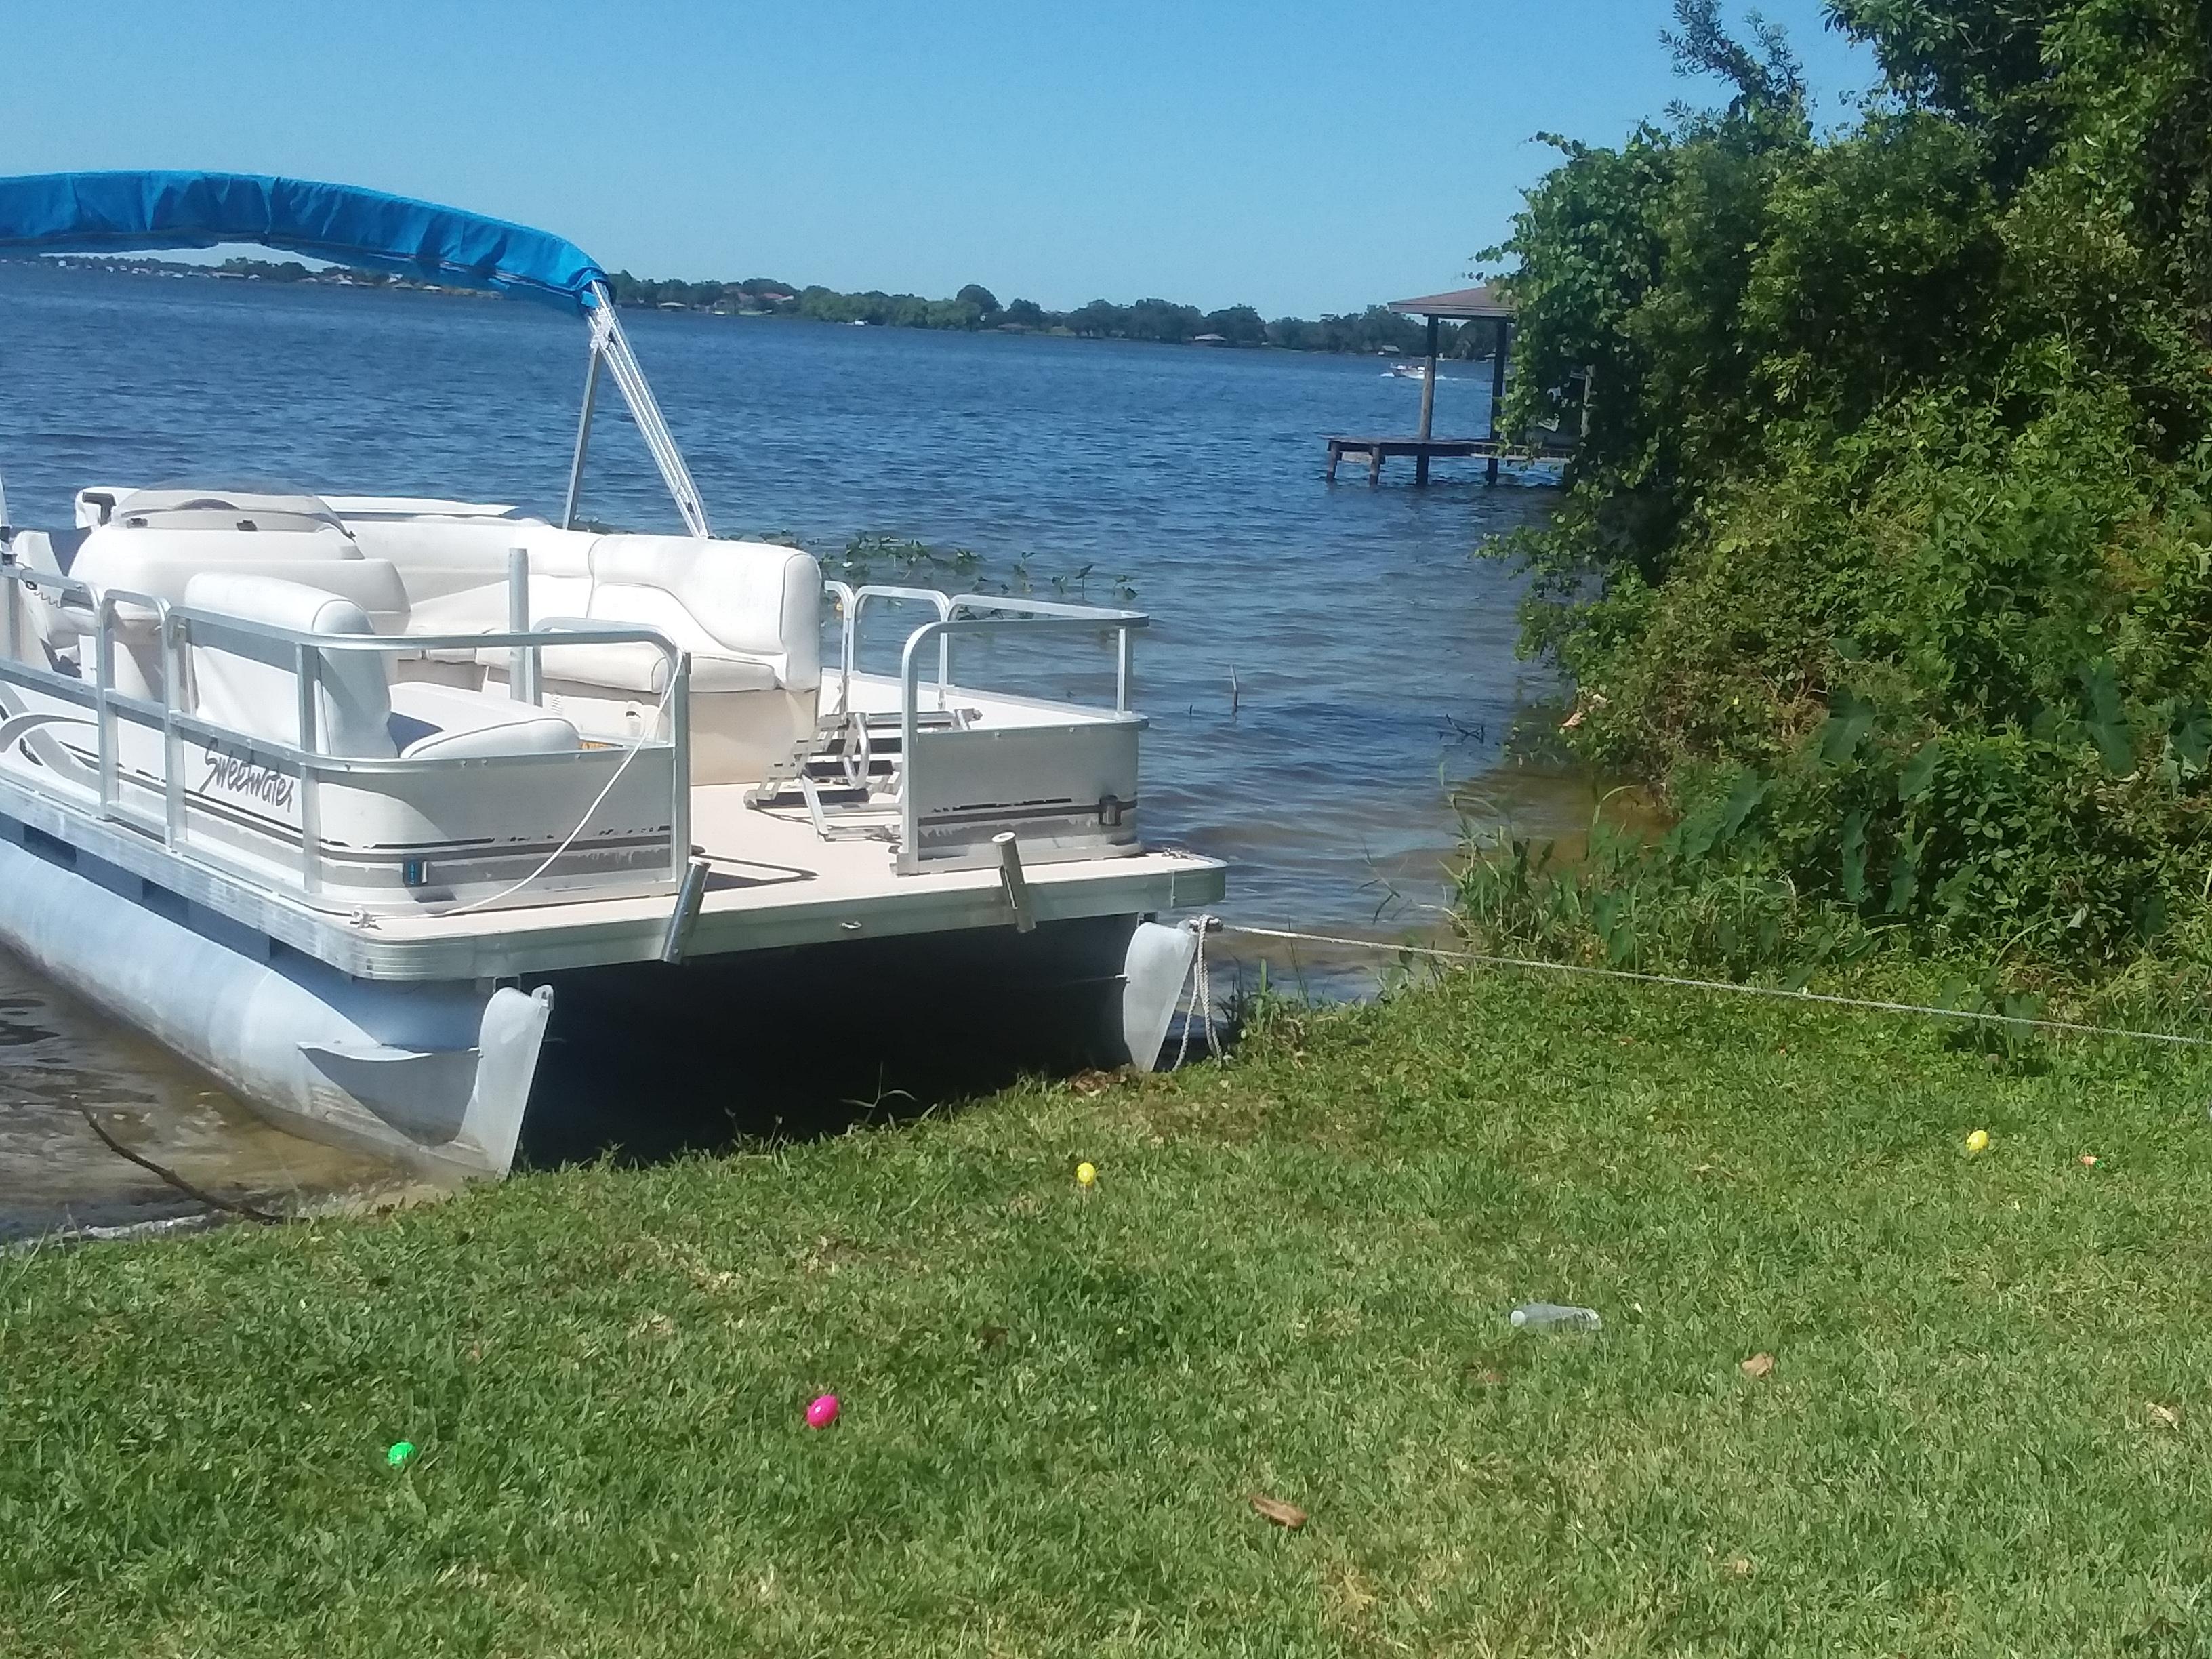 Woohoo Watersports Lake Placid Florida Boat Rental You